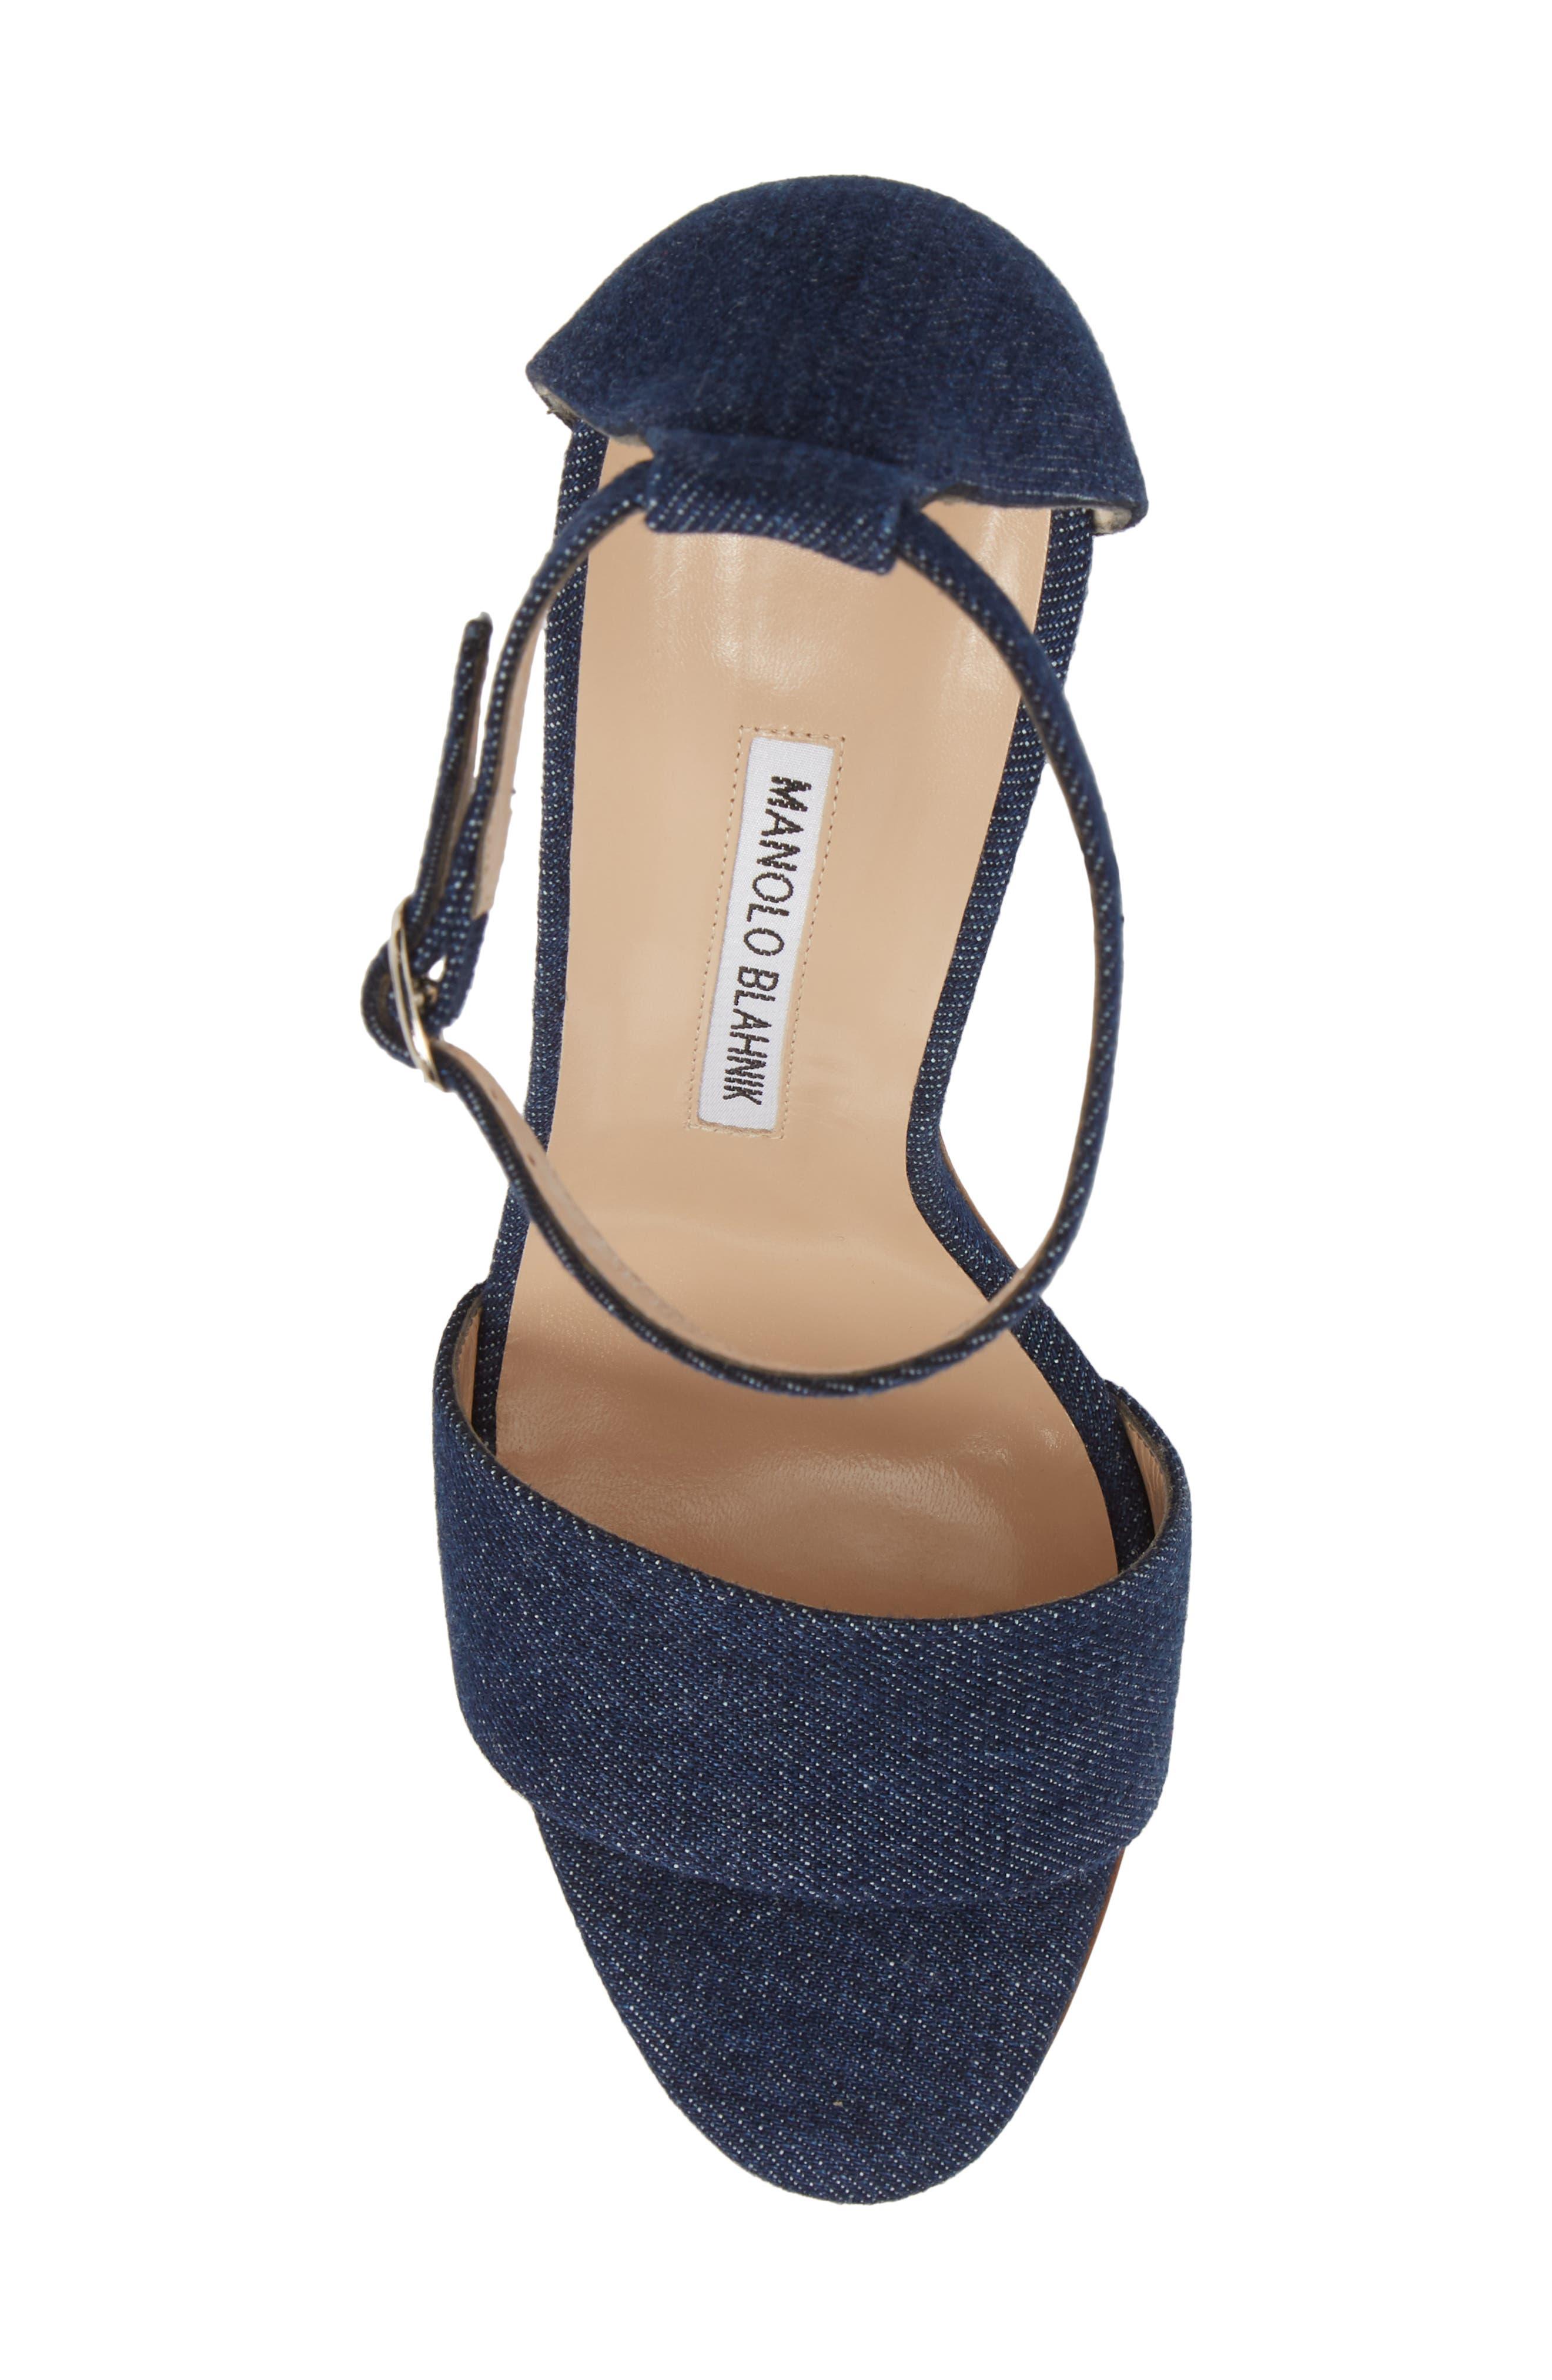 Tres Ankle Strap Sandal,                             Alternate thumbnail 5, color,                             DENIM BLUE